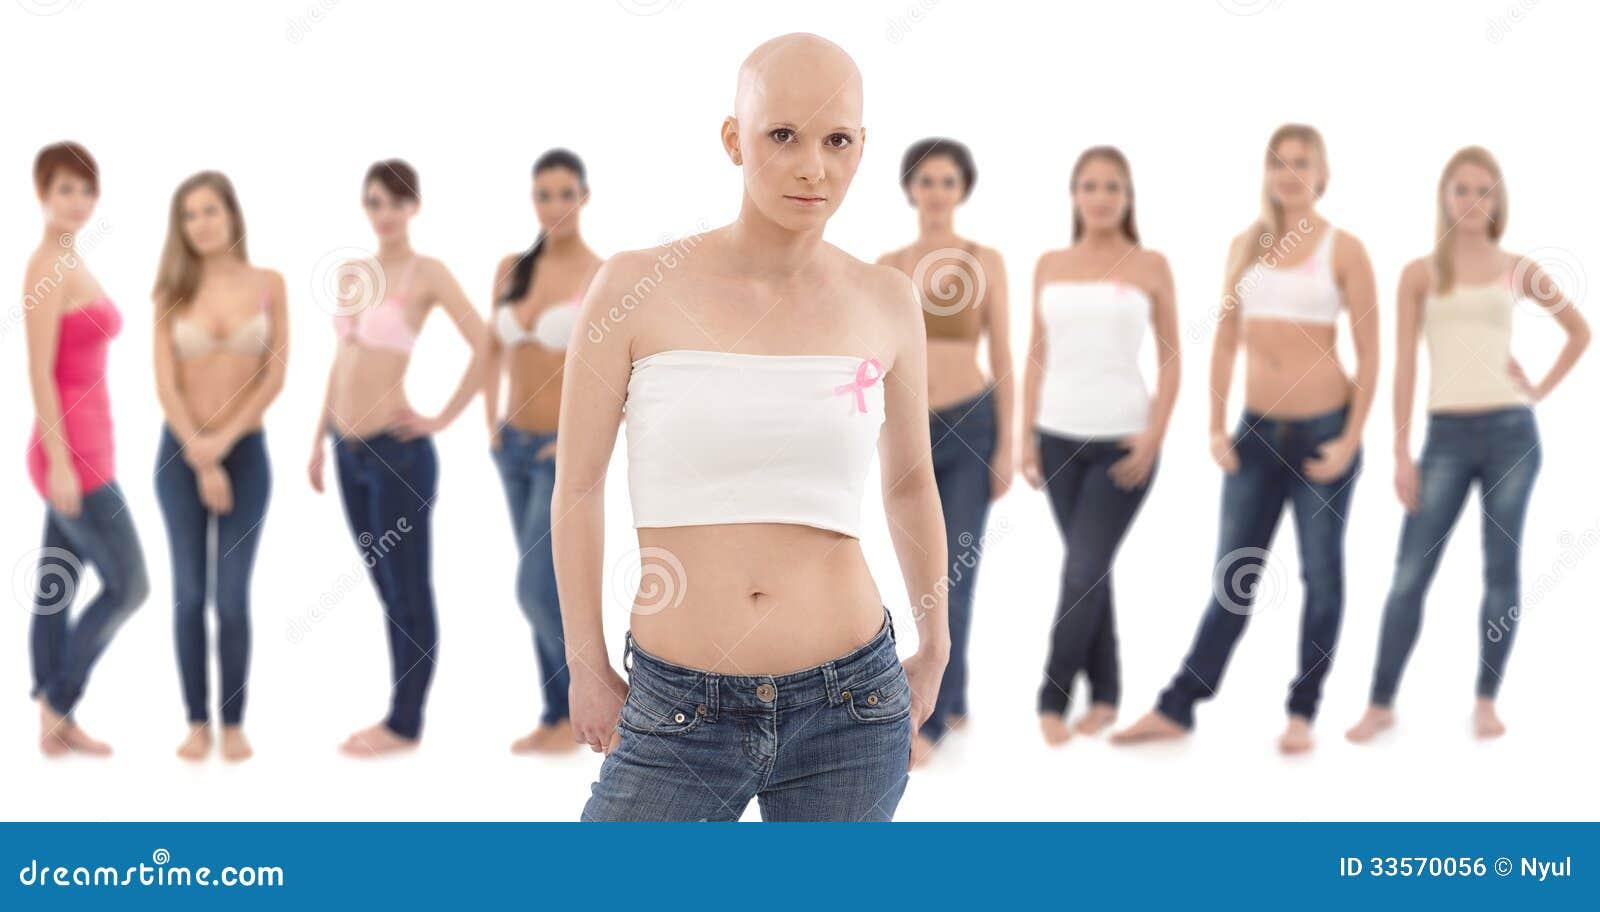 CANCER DU SEIN ET FEMME JEUNE - pesfrnetorg